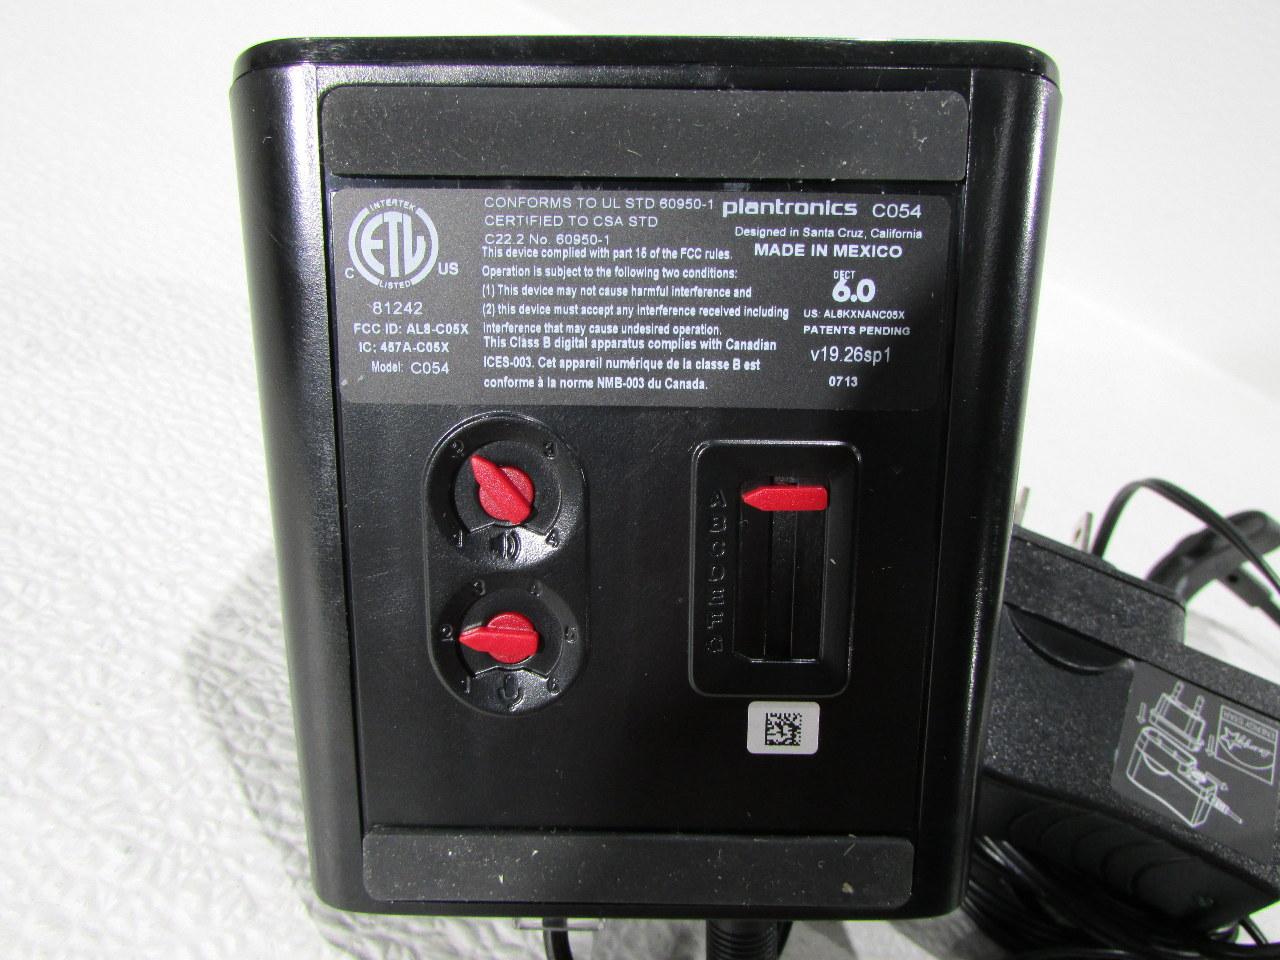 plantronics c054 headset instructions